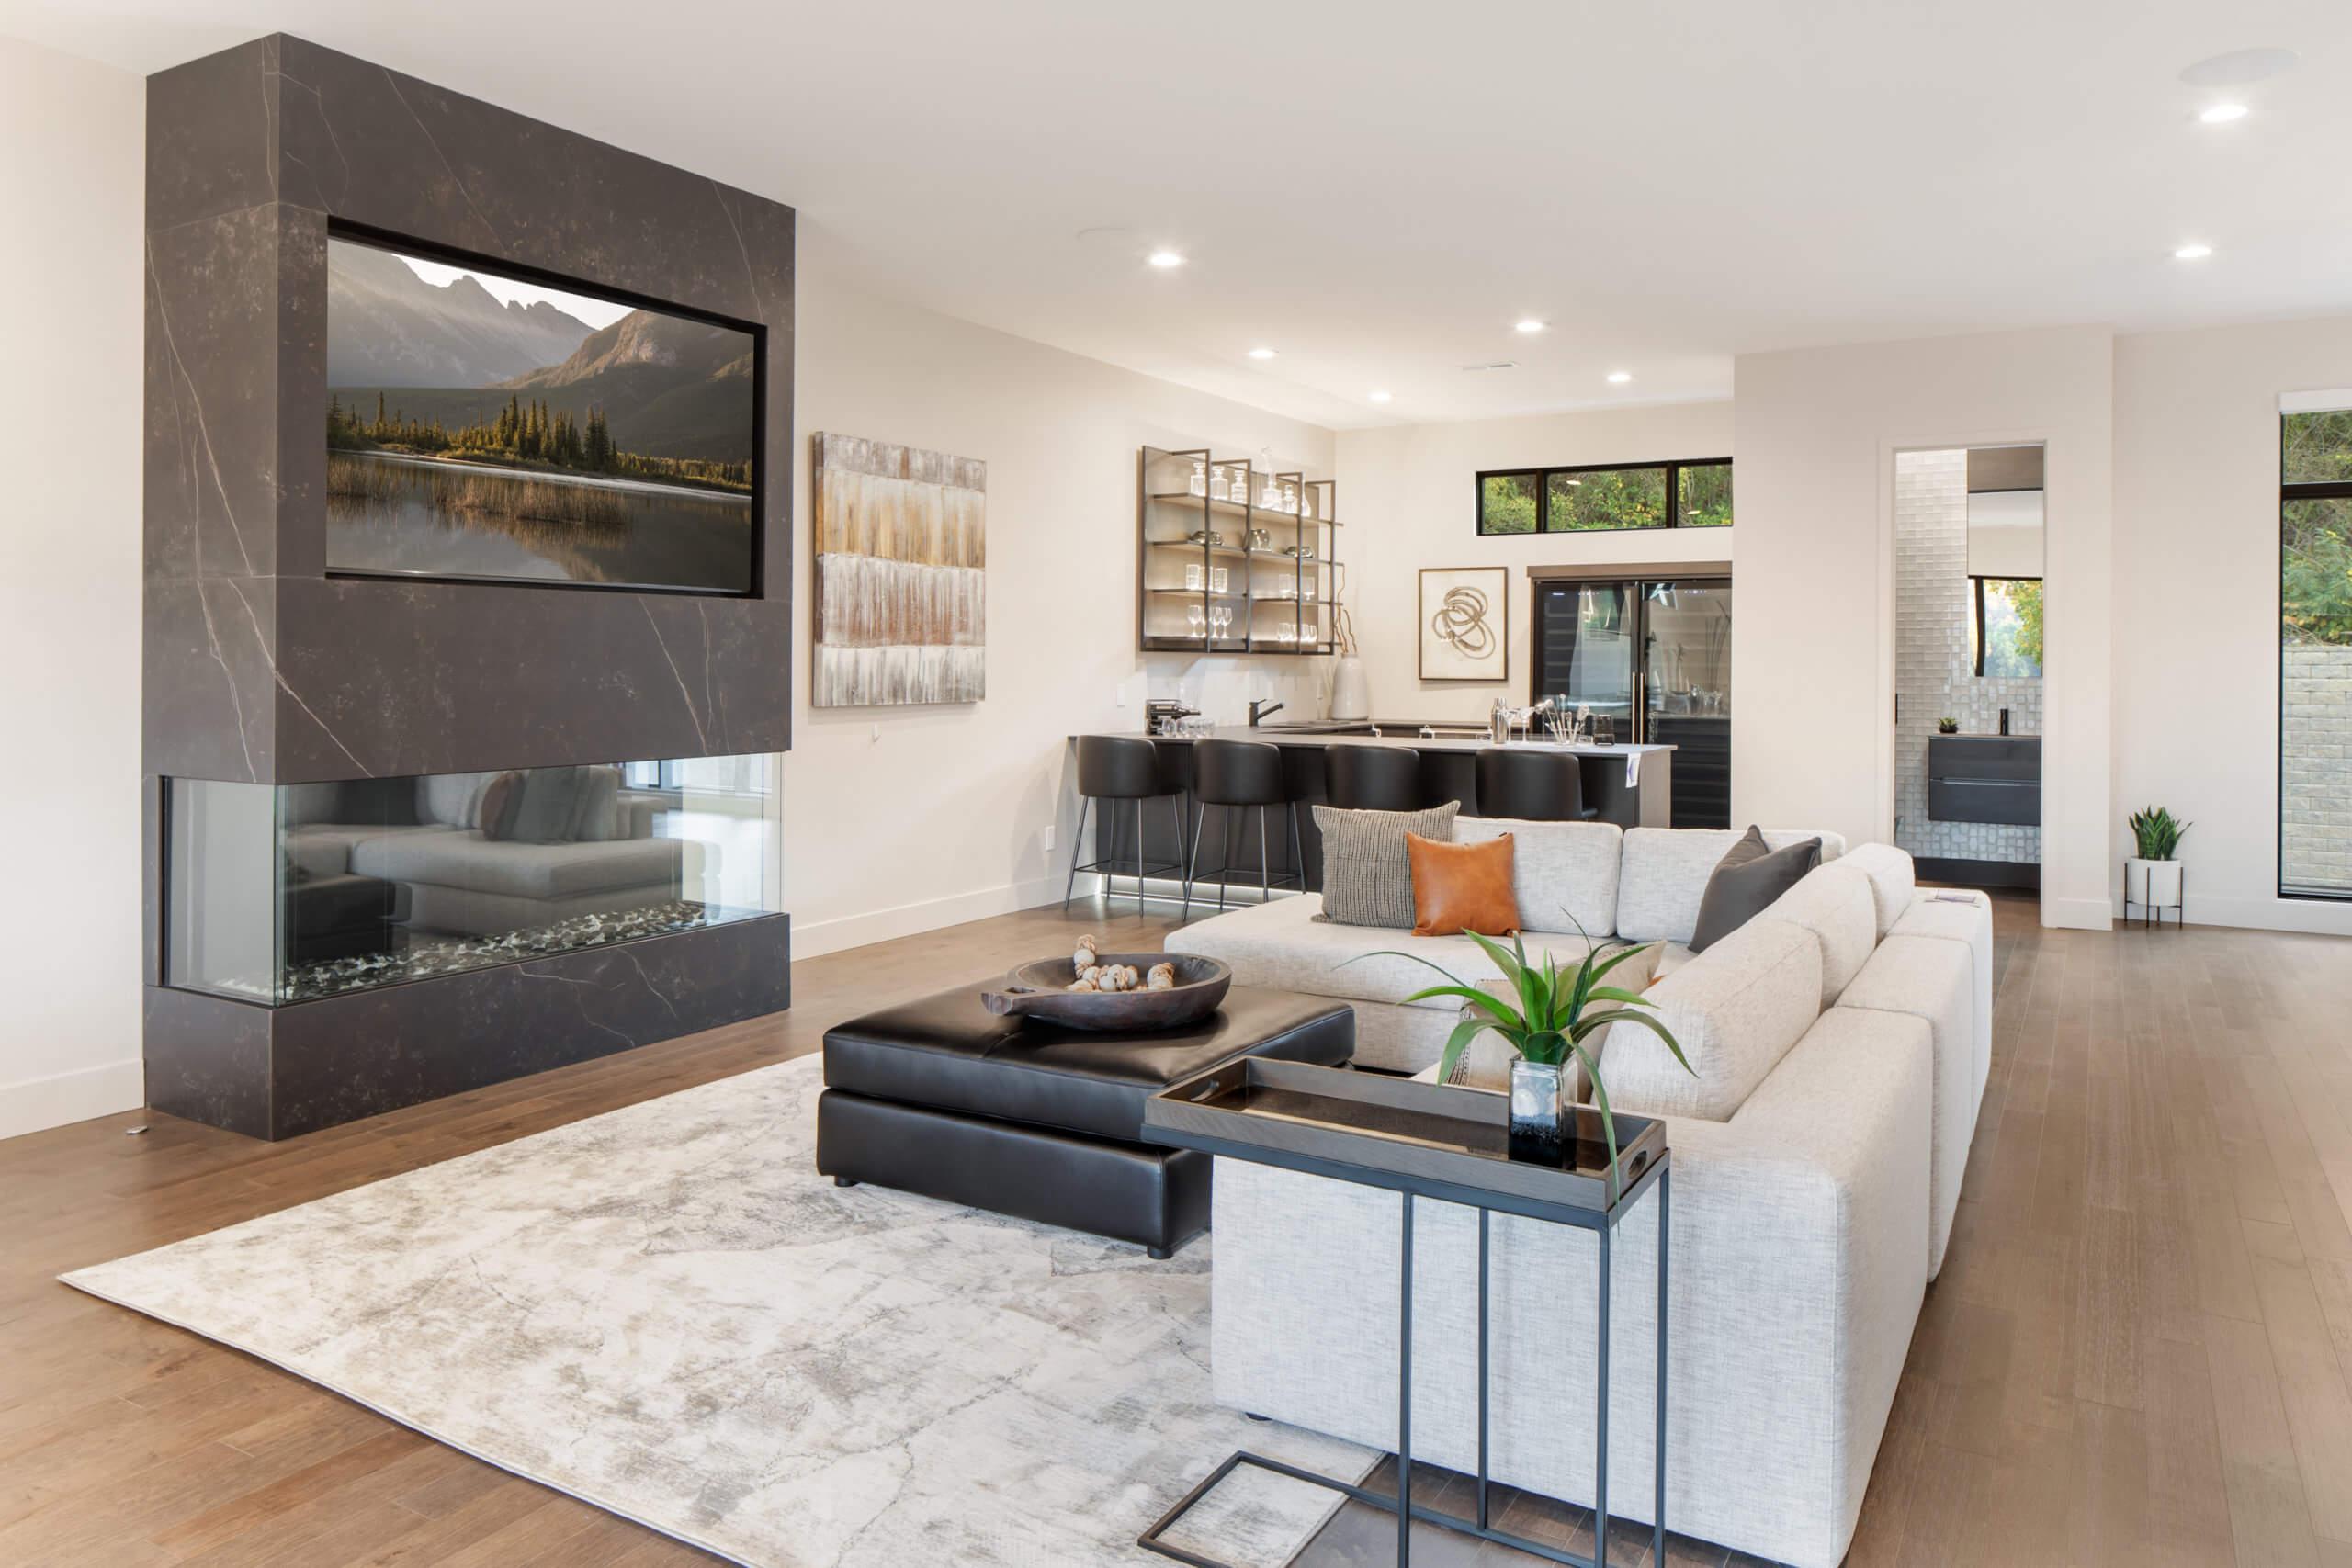 Modern living room and bar area by Cincinnati Interior Designer, RM Interiors.